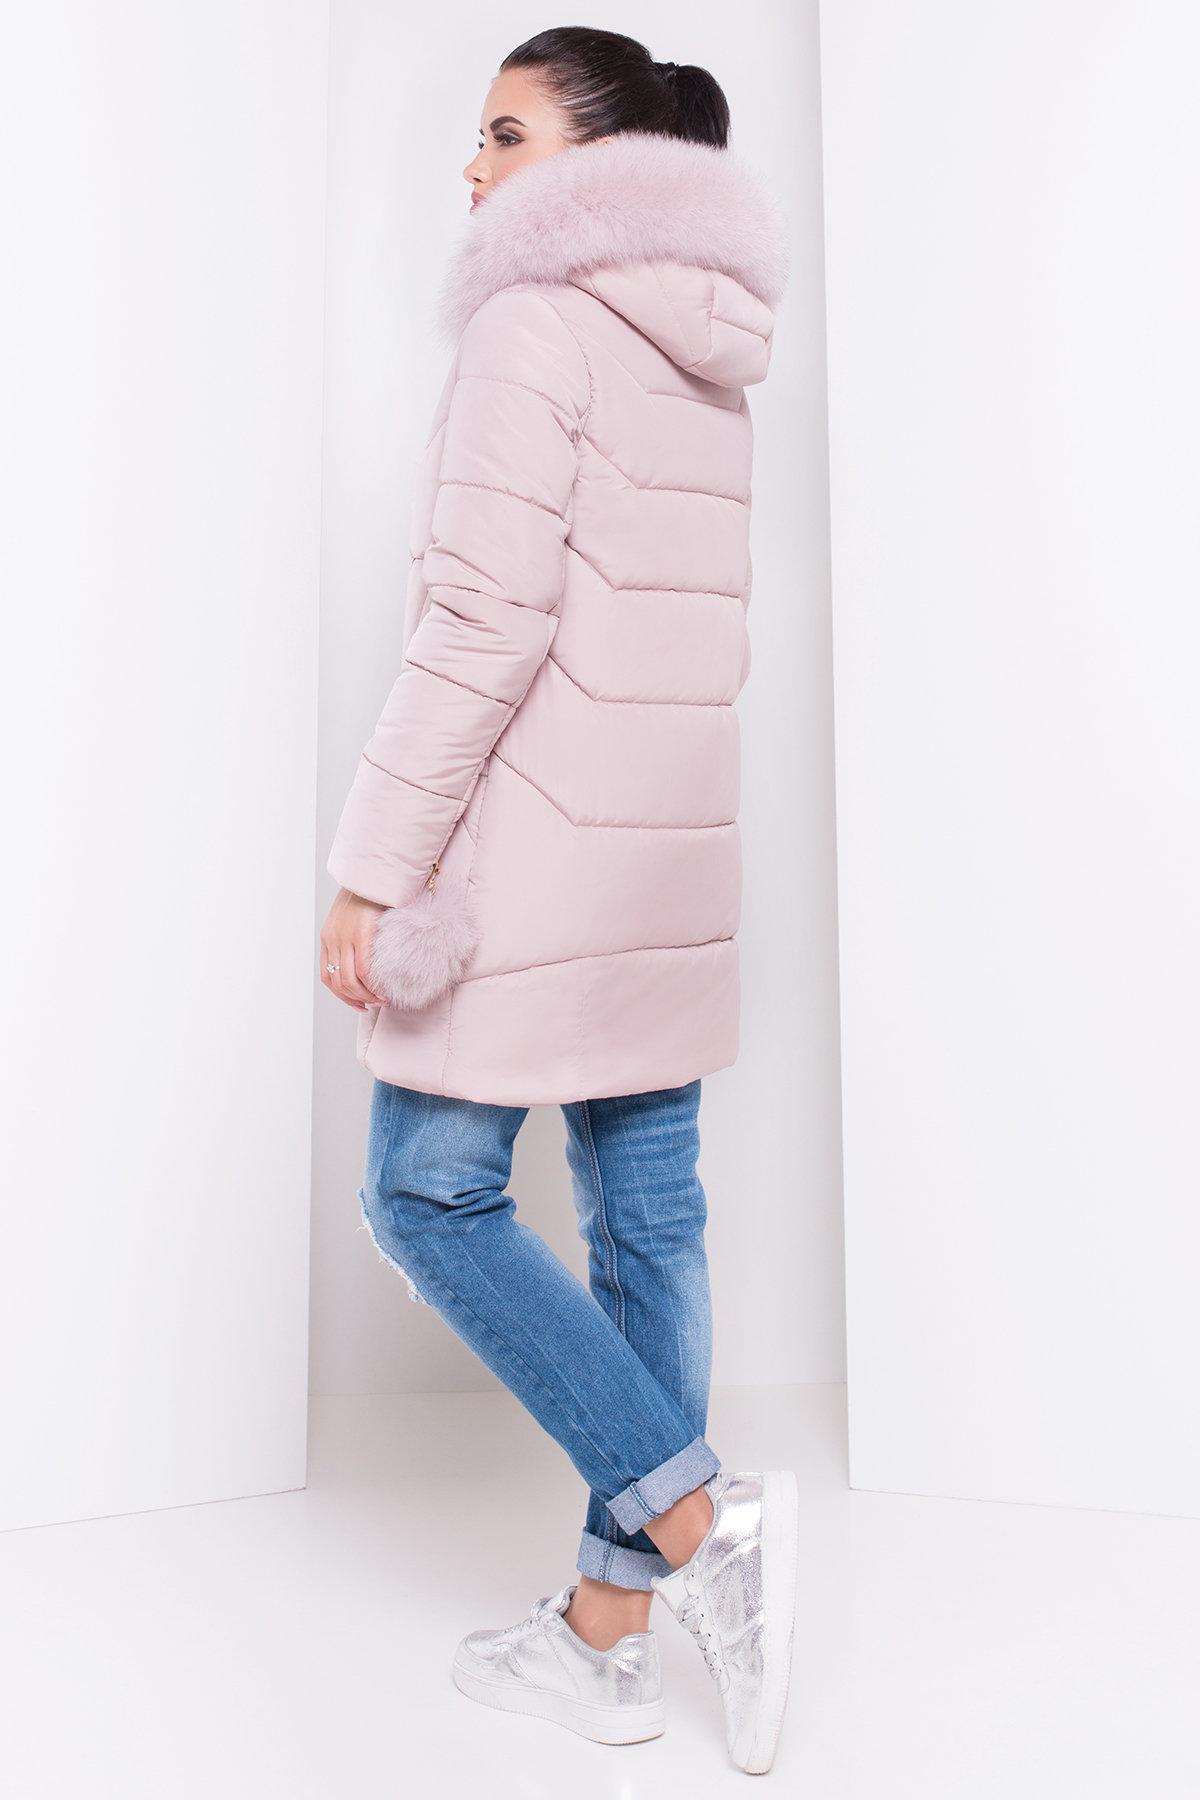 Пуховик Ари 3113 АРТ. 16412 Цвет: Серо-розовый - фото 3, интернет магазин tm-modus.ru